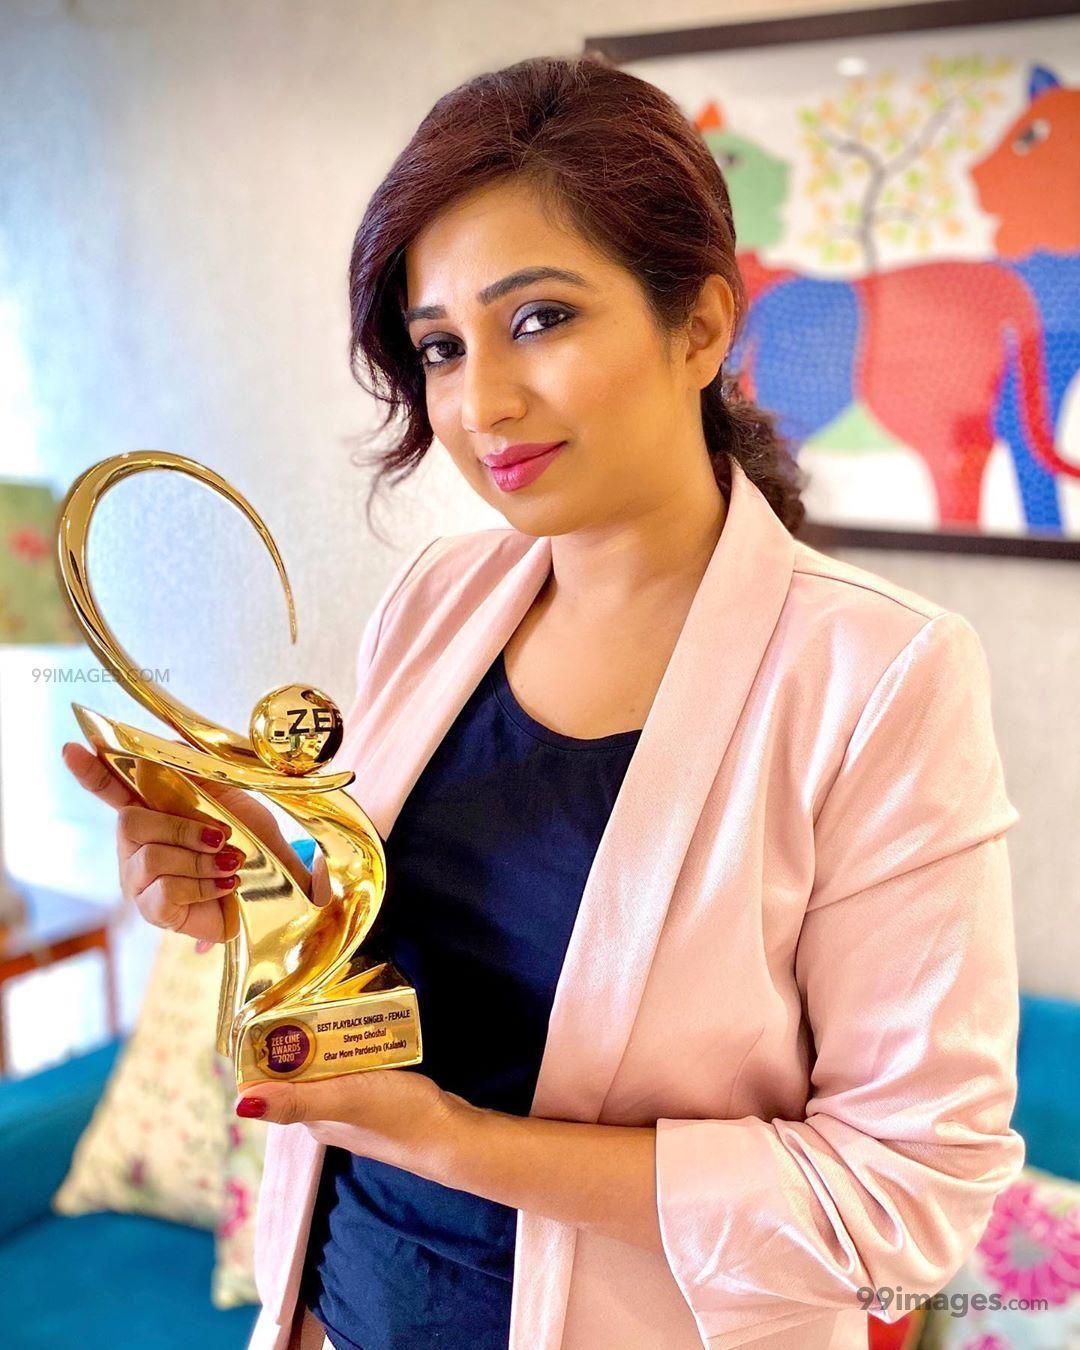 Shreya Ghoshal Awards and Achievements: